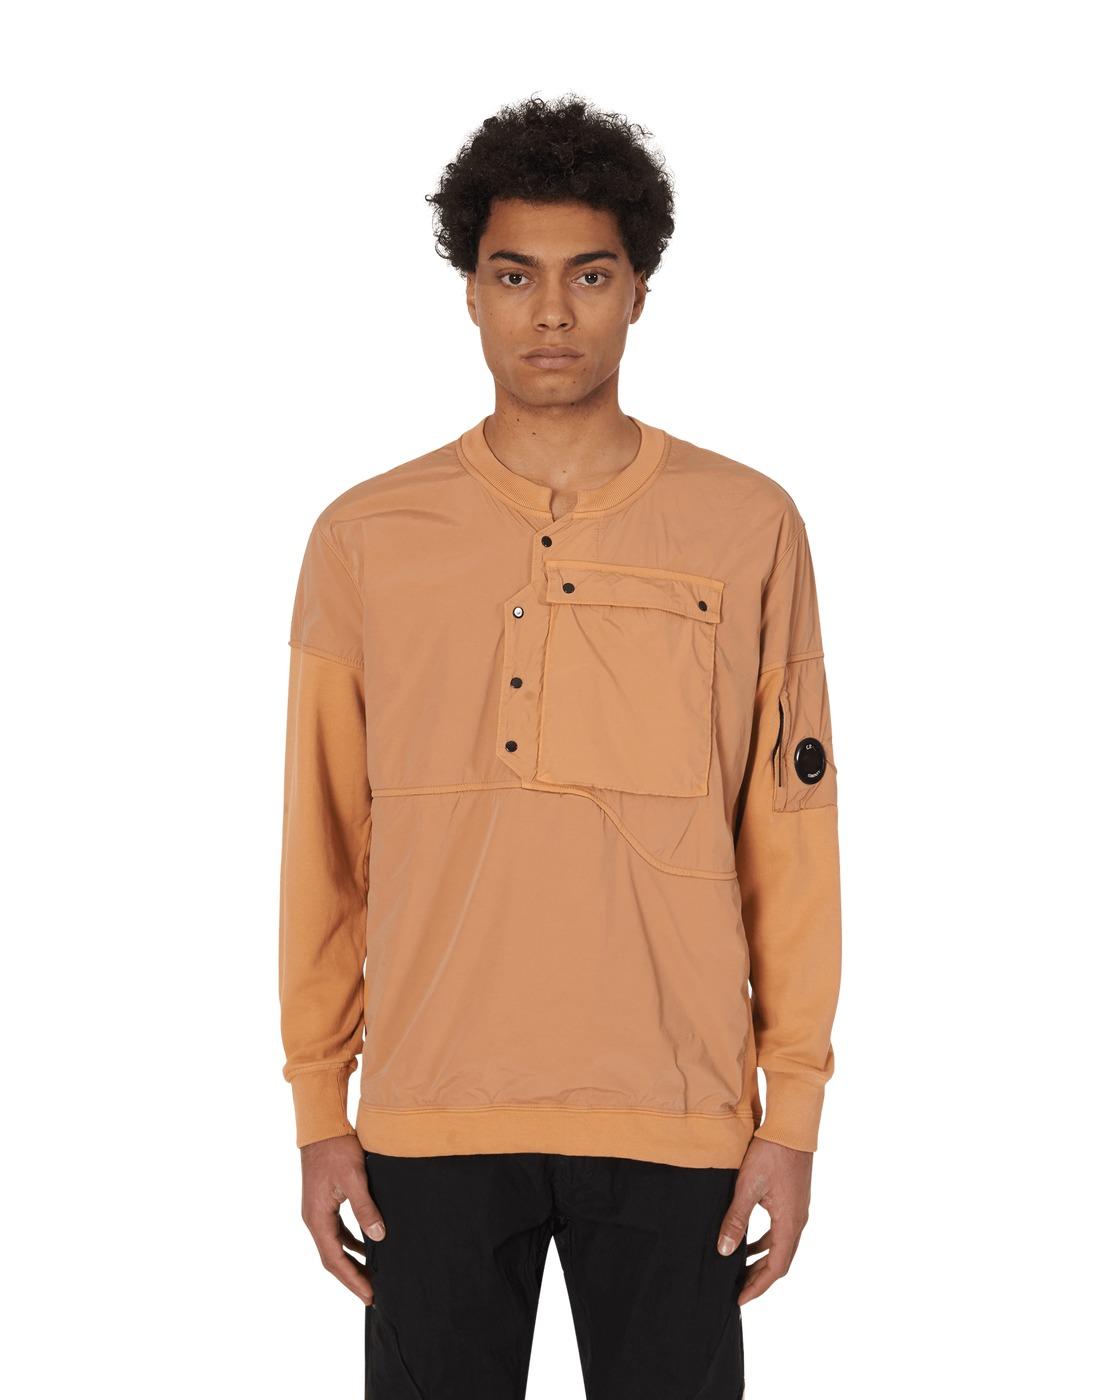 C.P. Company Front Pocket Crewneck Sweatshirt Topaz